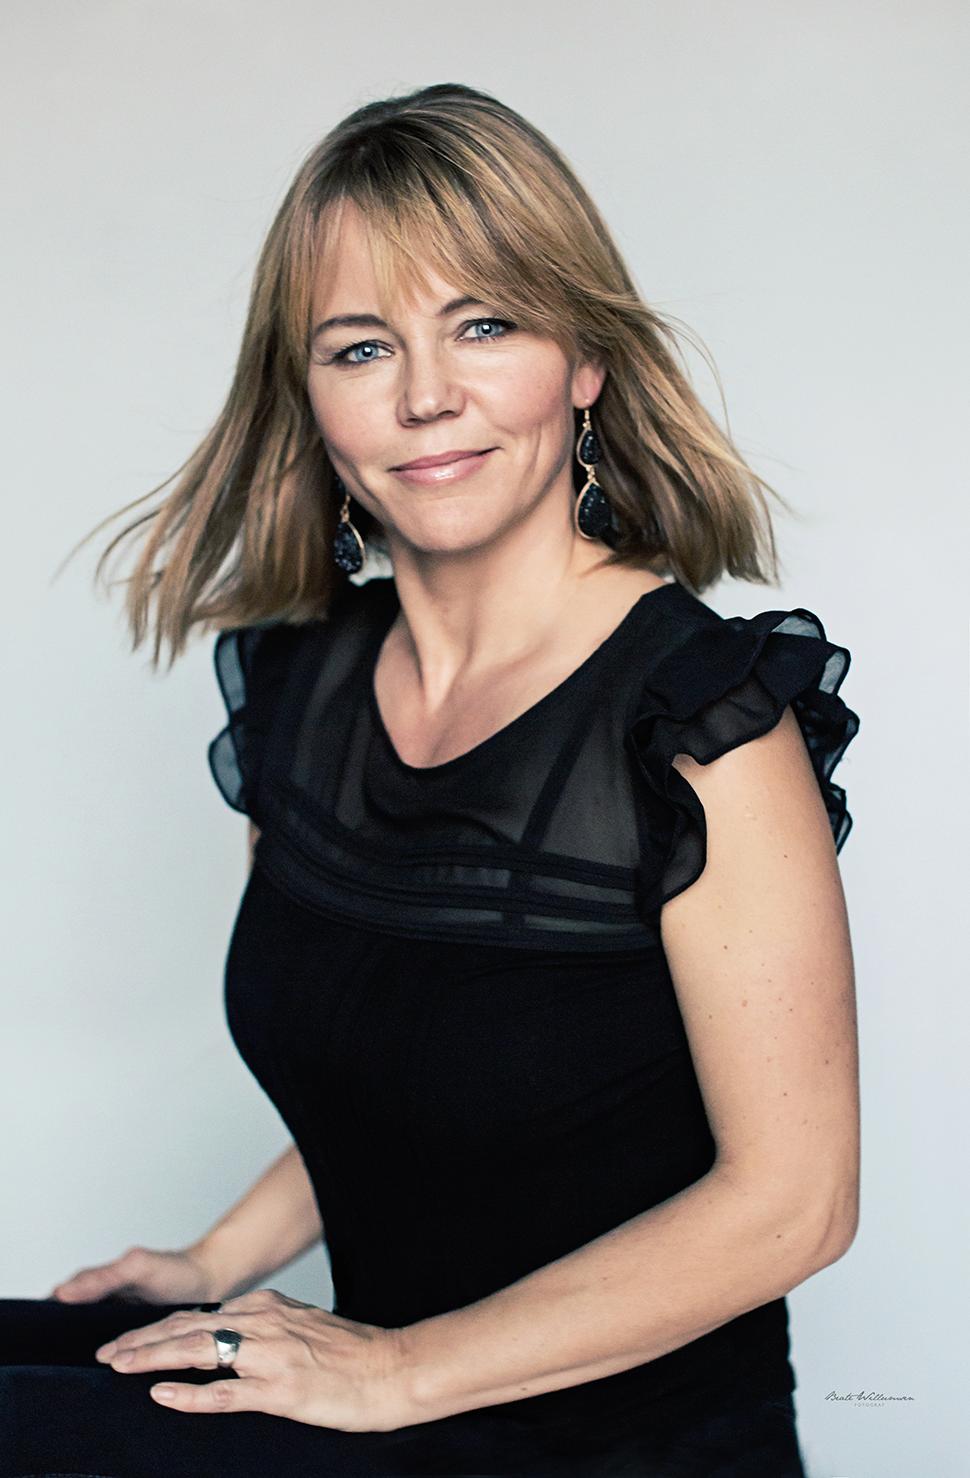 Anita Sælø